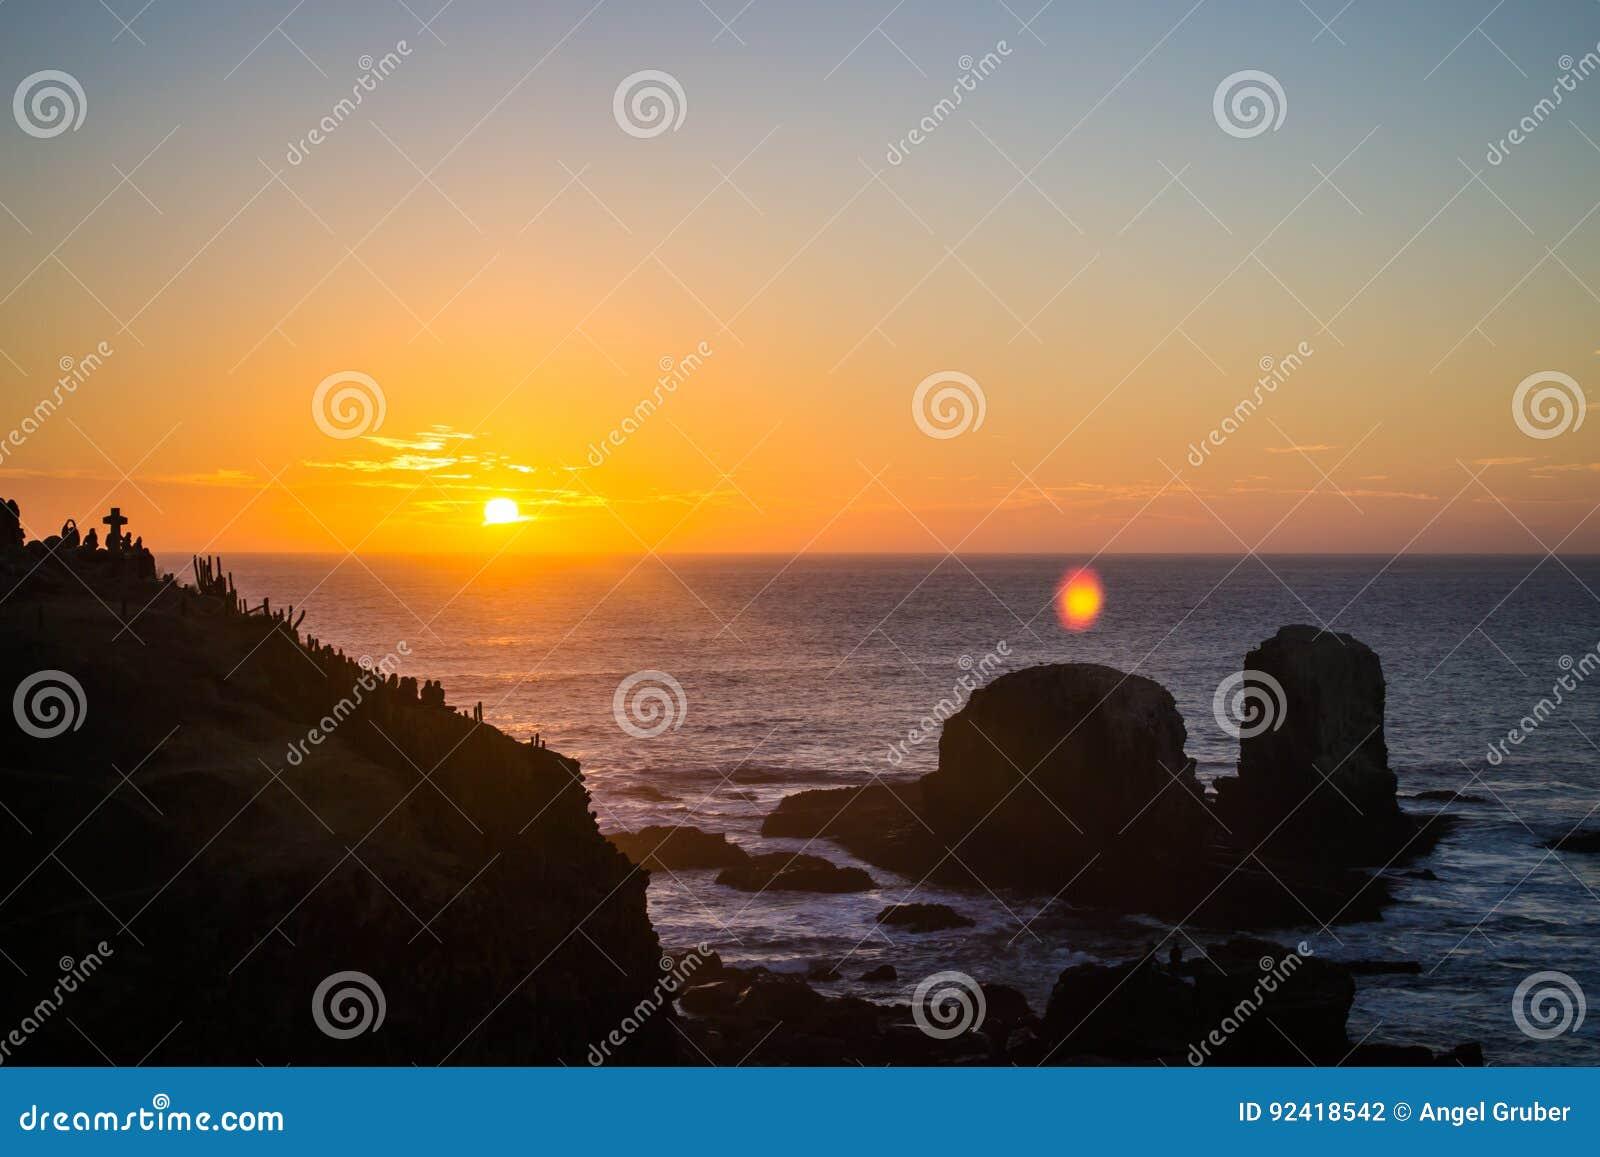 Orange sunset at the beach